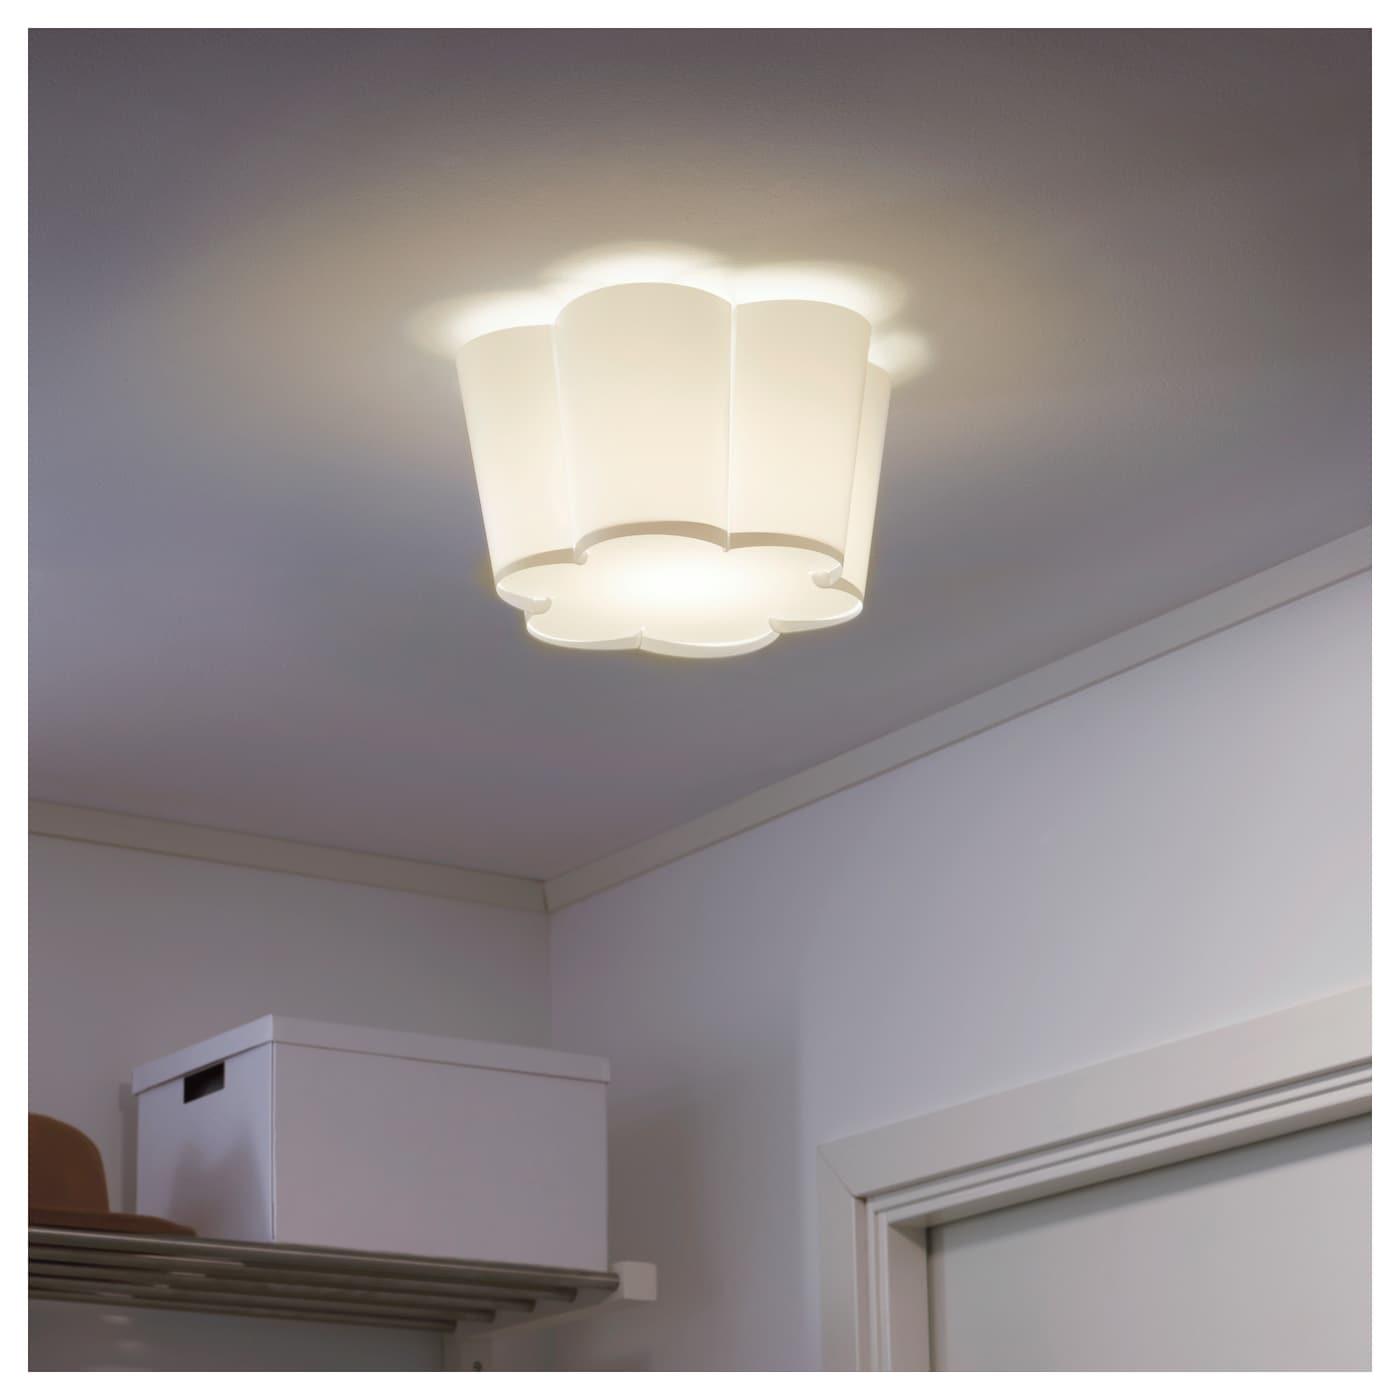 type chandelier length pendants h wire ceiling shopping feet lighting pendant restaurant kiven track decorative light online lights stglighting